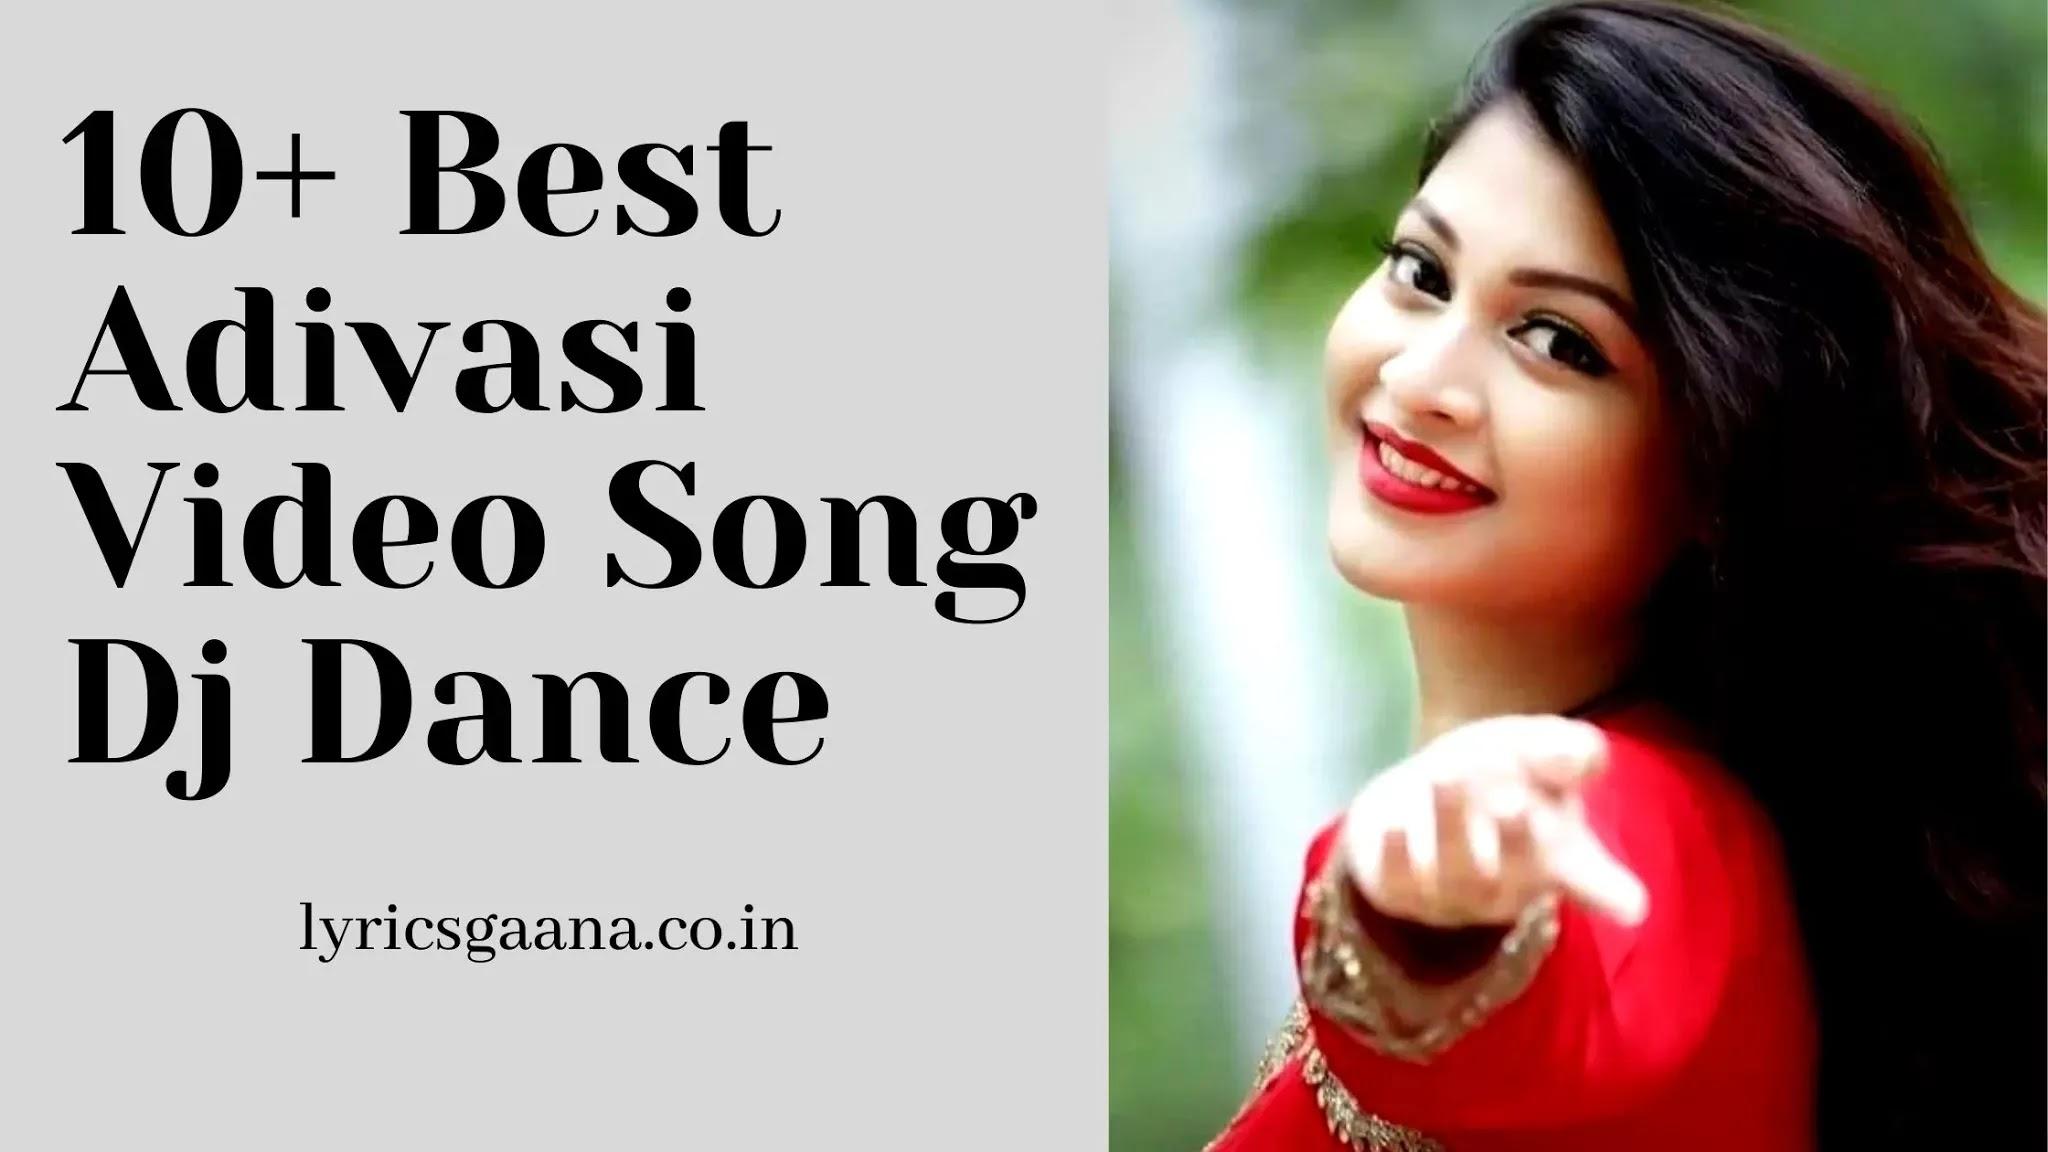 10 Best Adivasi Video Song Adivasi Video Timli Gana 2019-2020